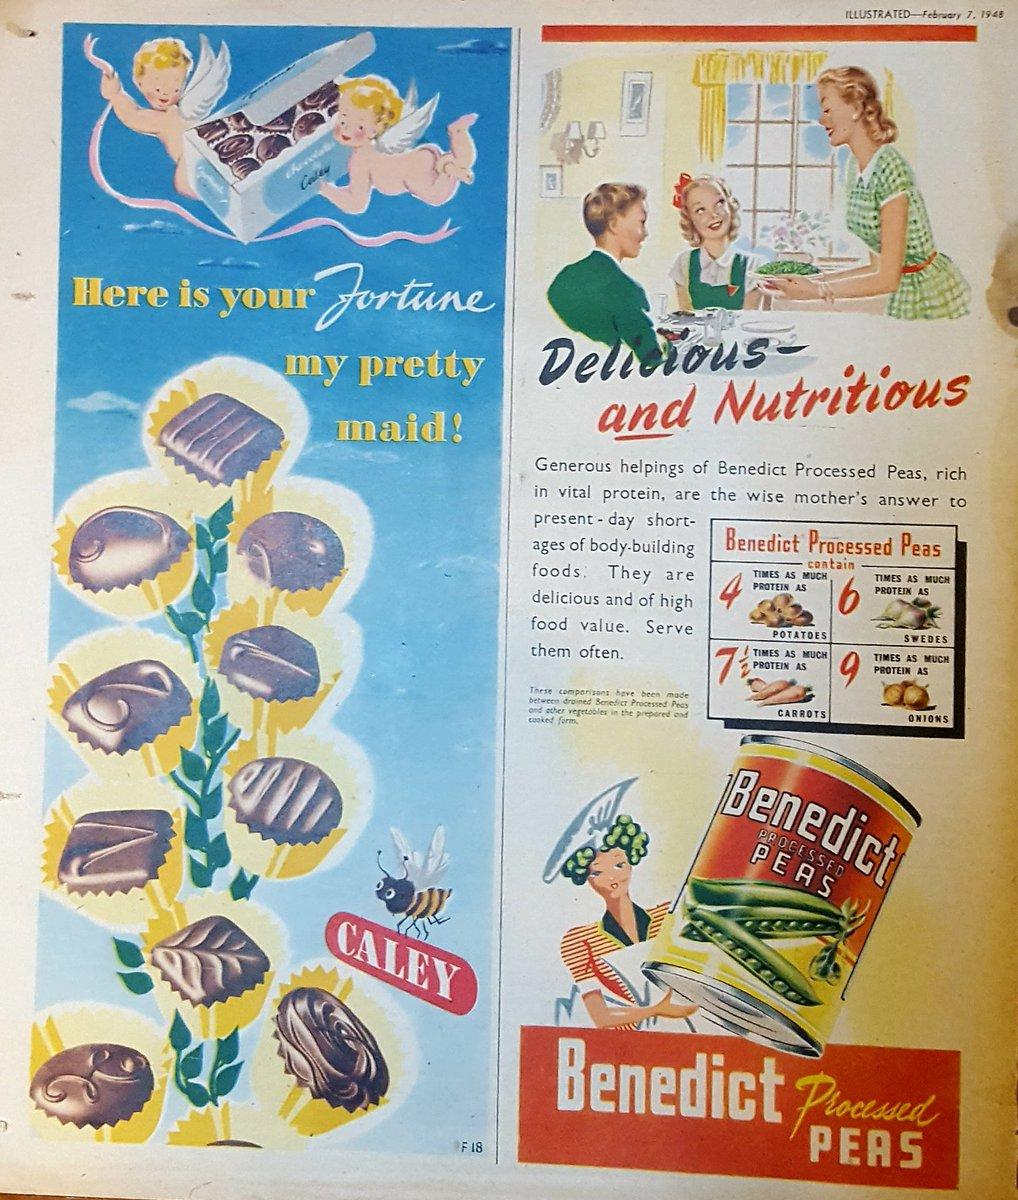 Chocolates or processed peas for that #FridayFeeling?! #vintage #vintageadvertising #illustration #illustratedmagazine #chocolate #peas <br>http://pic.twitter.com/DNCoY0xomq